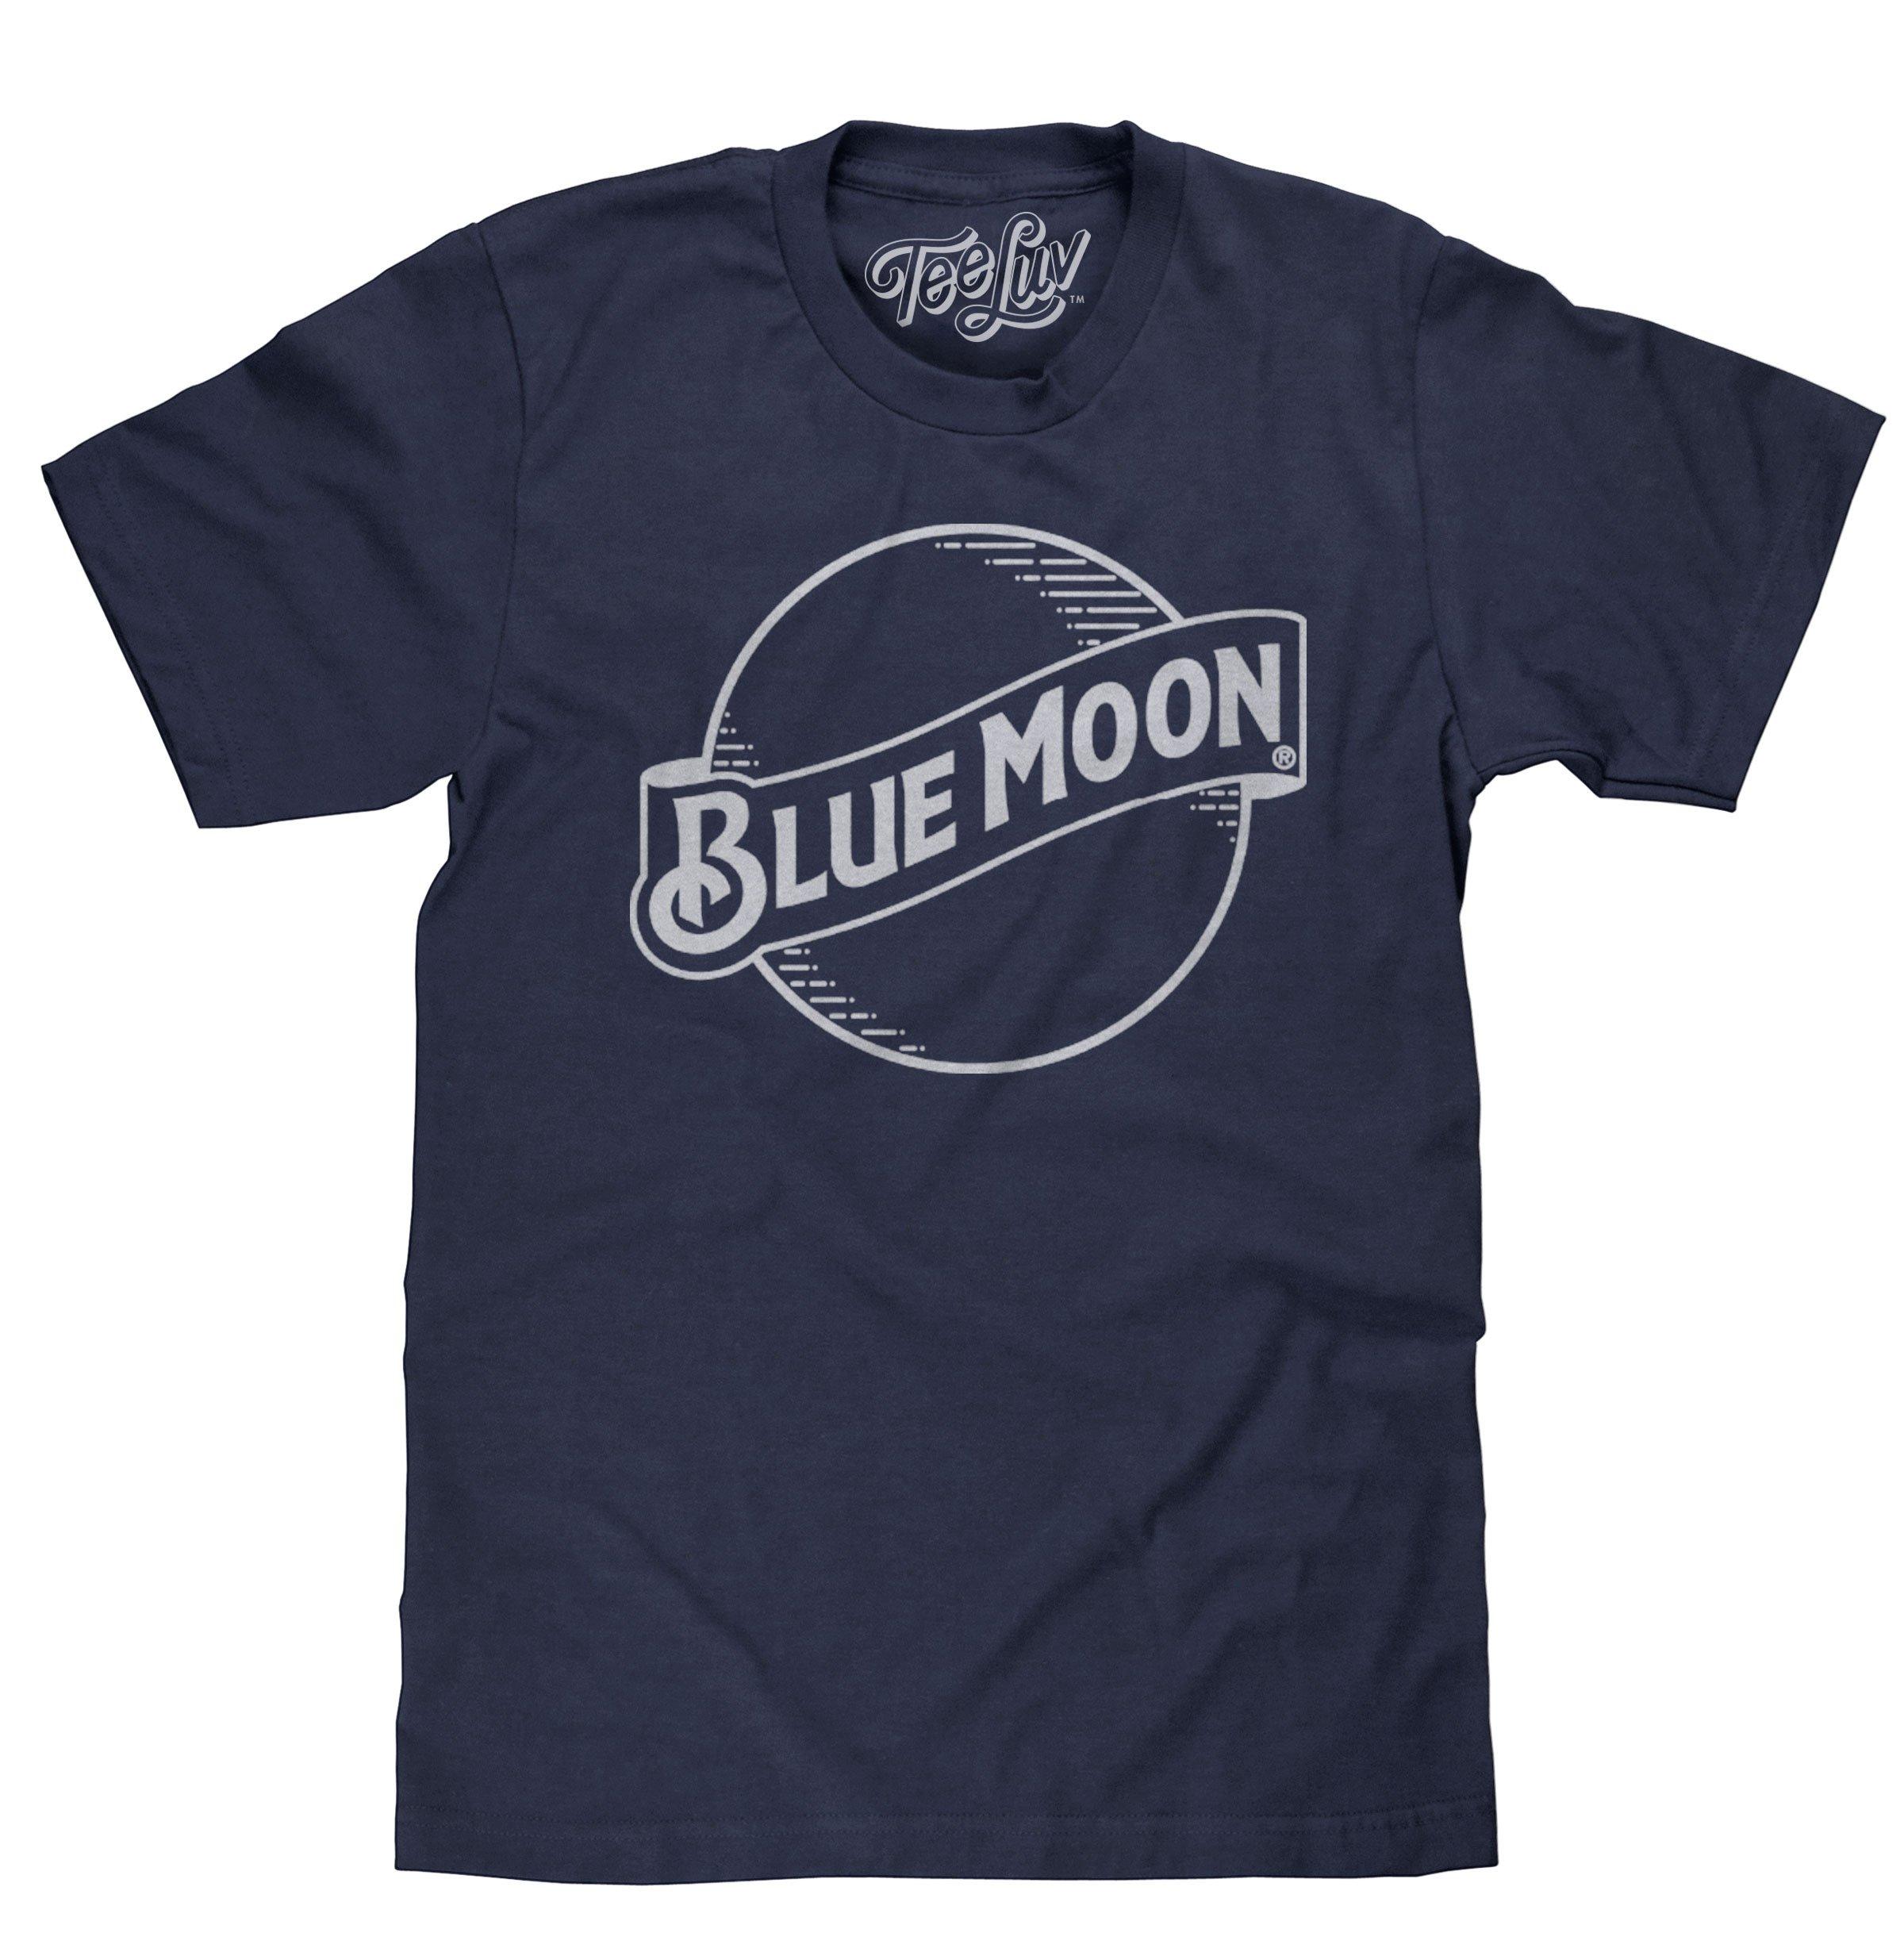 Blue Moon Beer Tshirt Blue Moon Brewing Company Logo Shirt